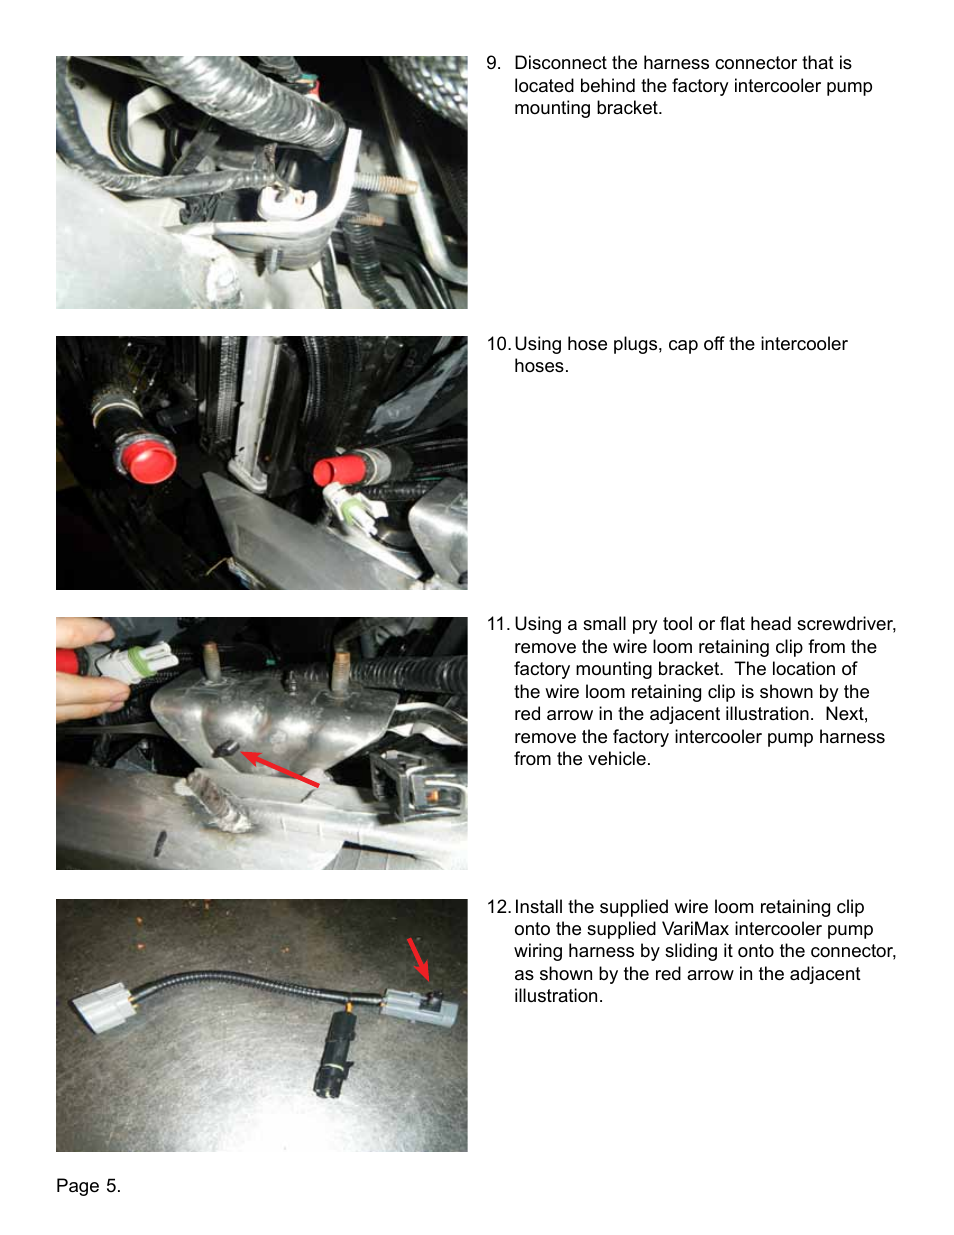 Lingenfelter L330030709 Ctsv High Flow Intercooler Pump Upgrade Kit Wiring Harness Clips Removal V10 User Manual Page 6 10